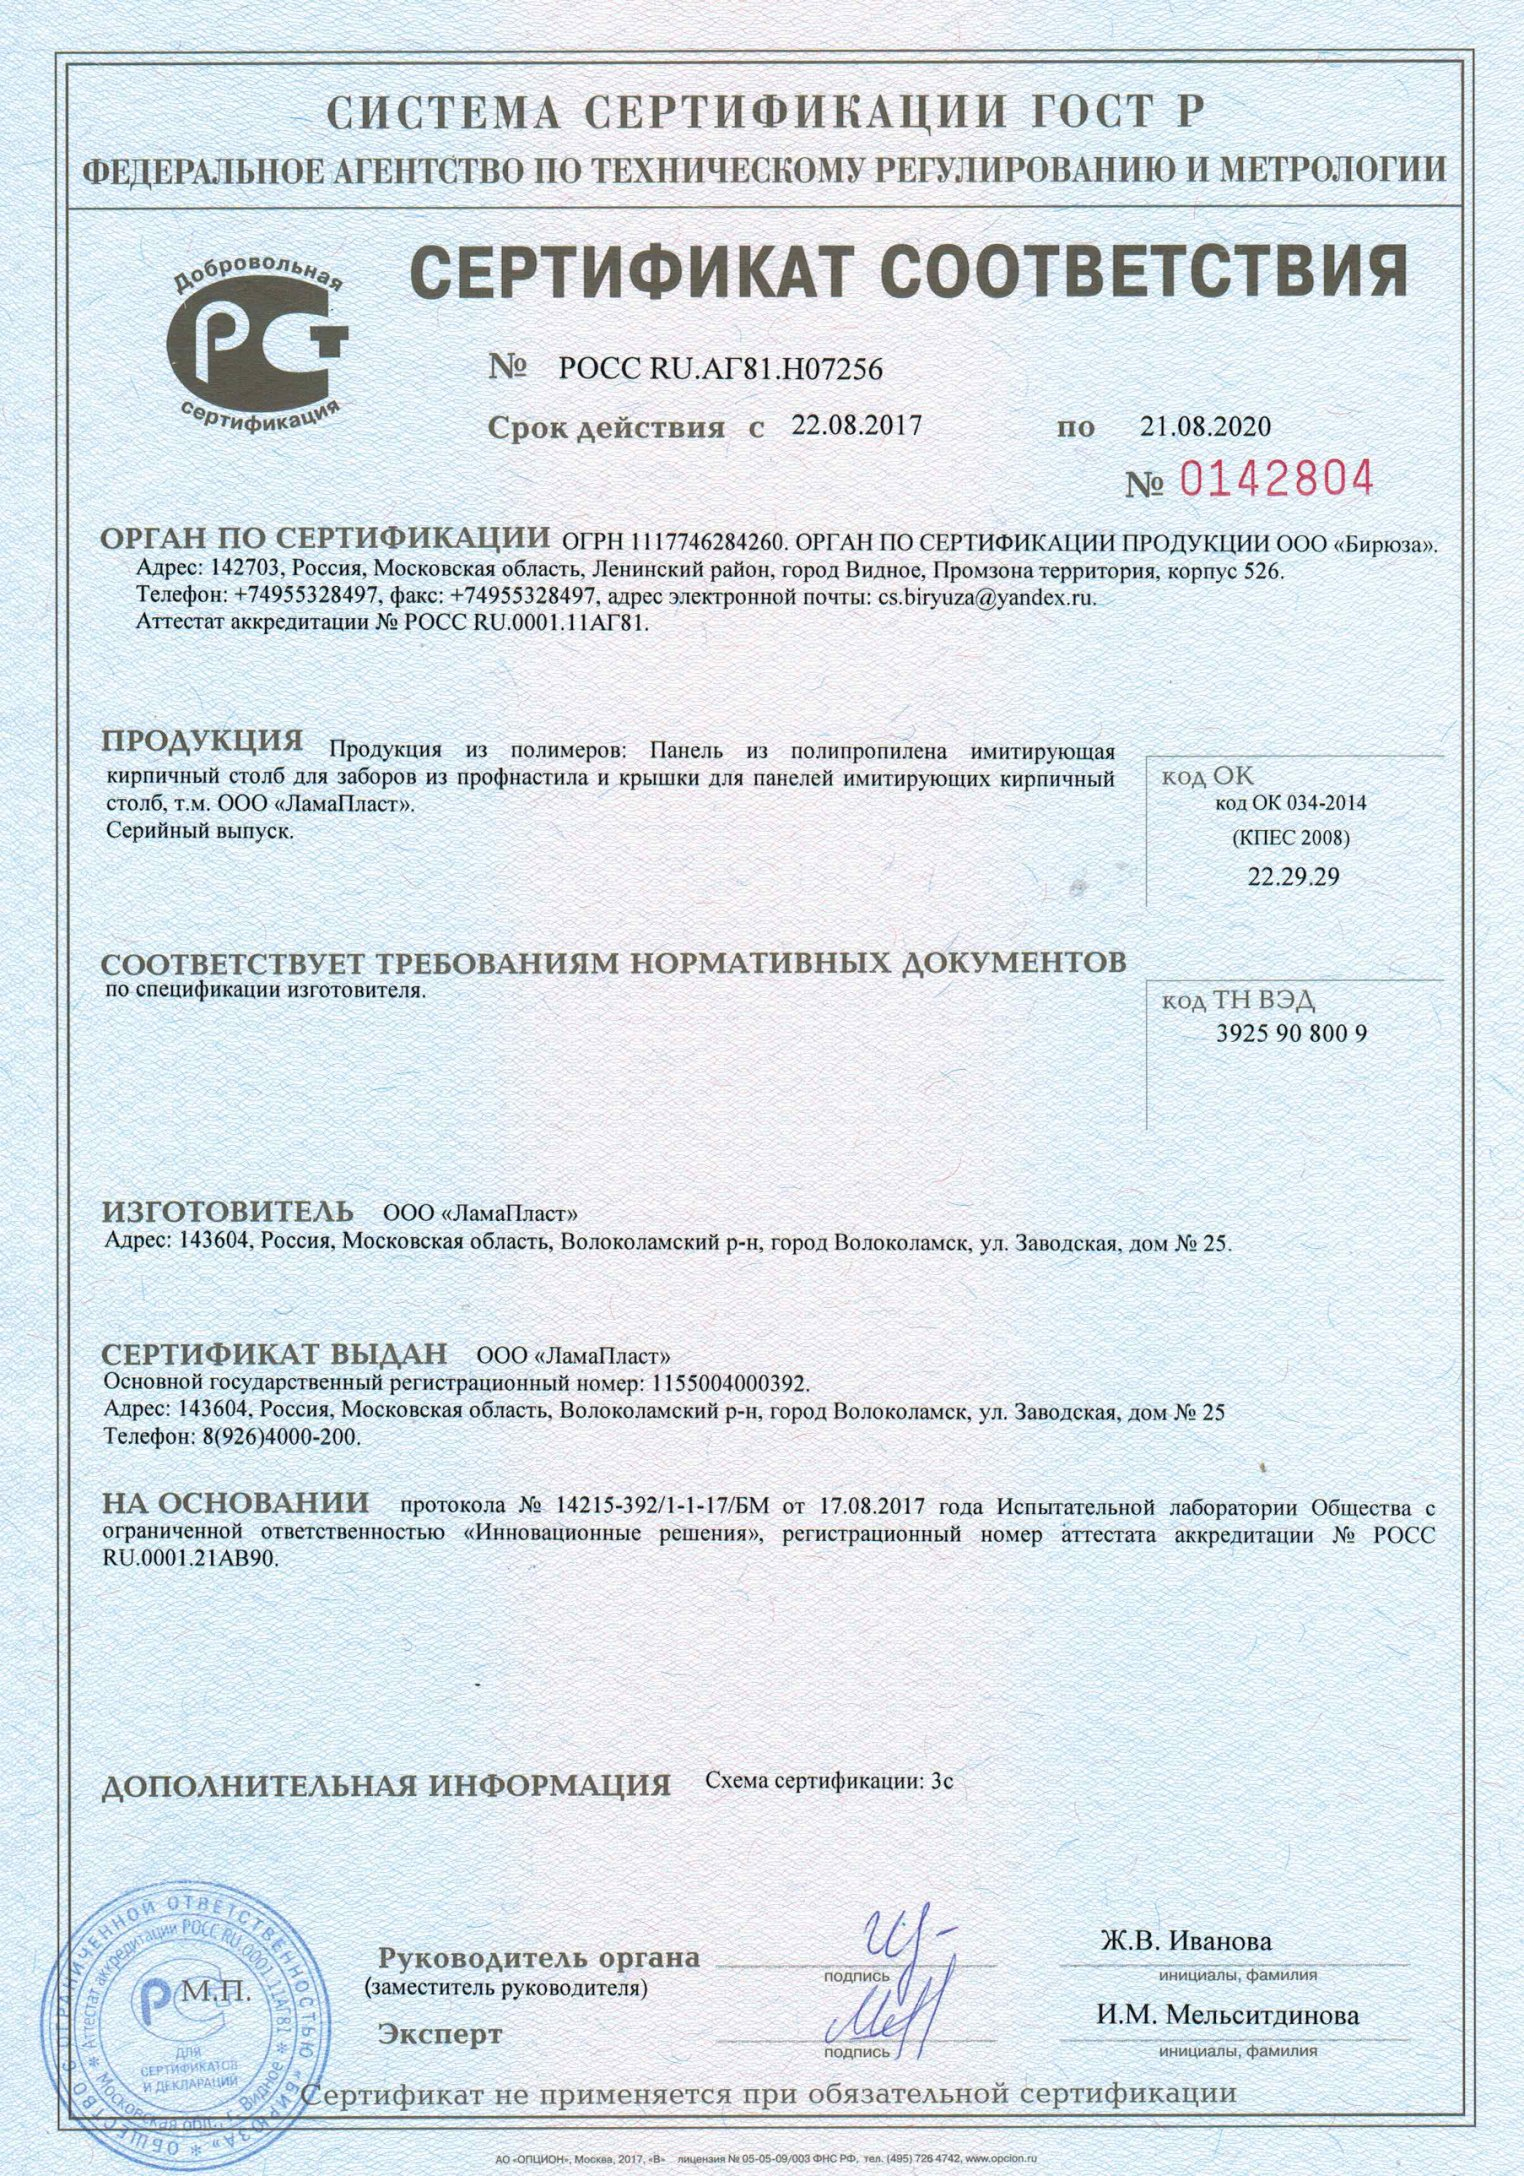 сертификат 2 (1)